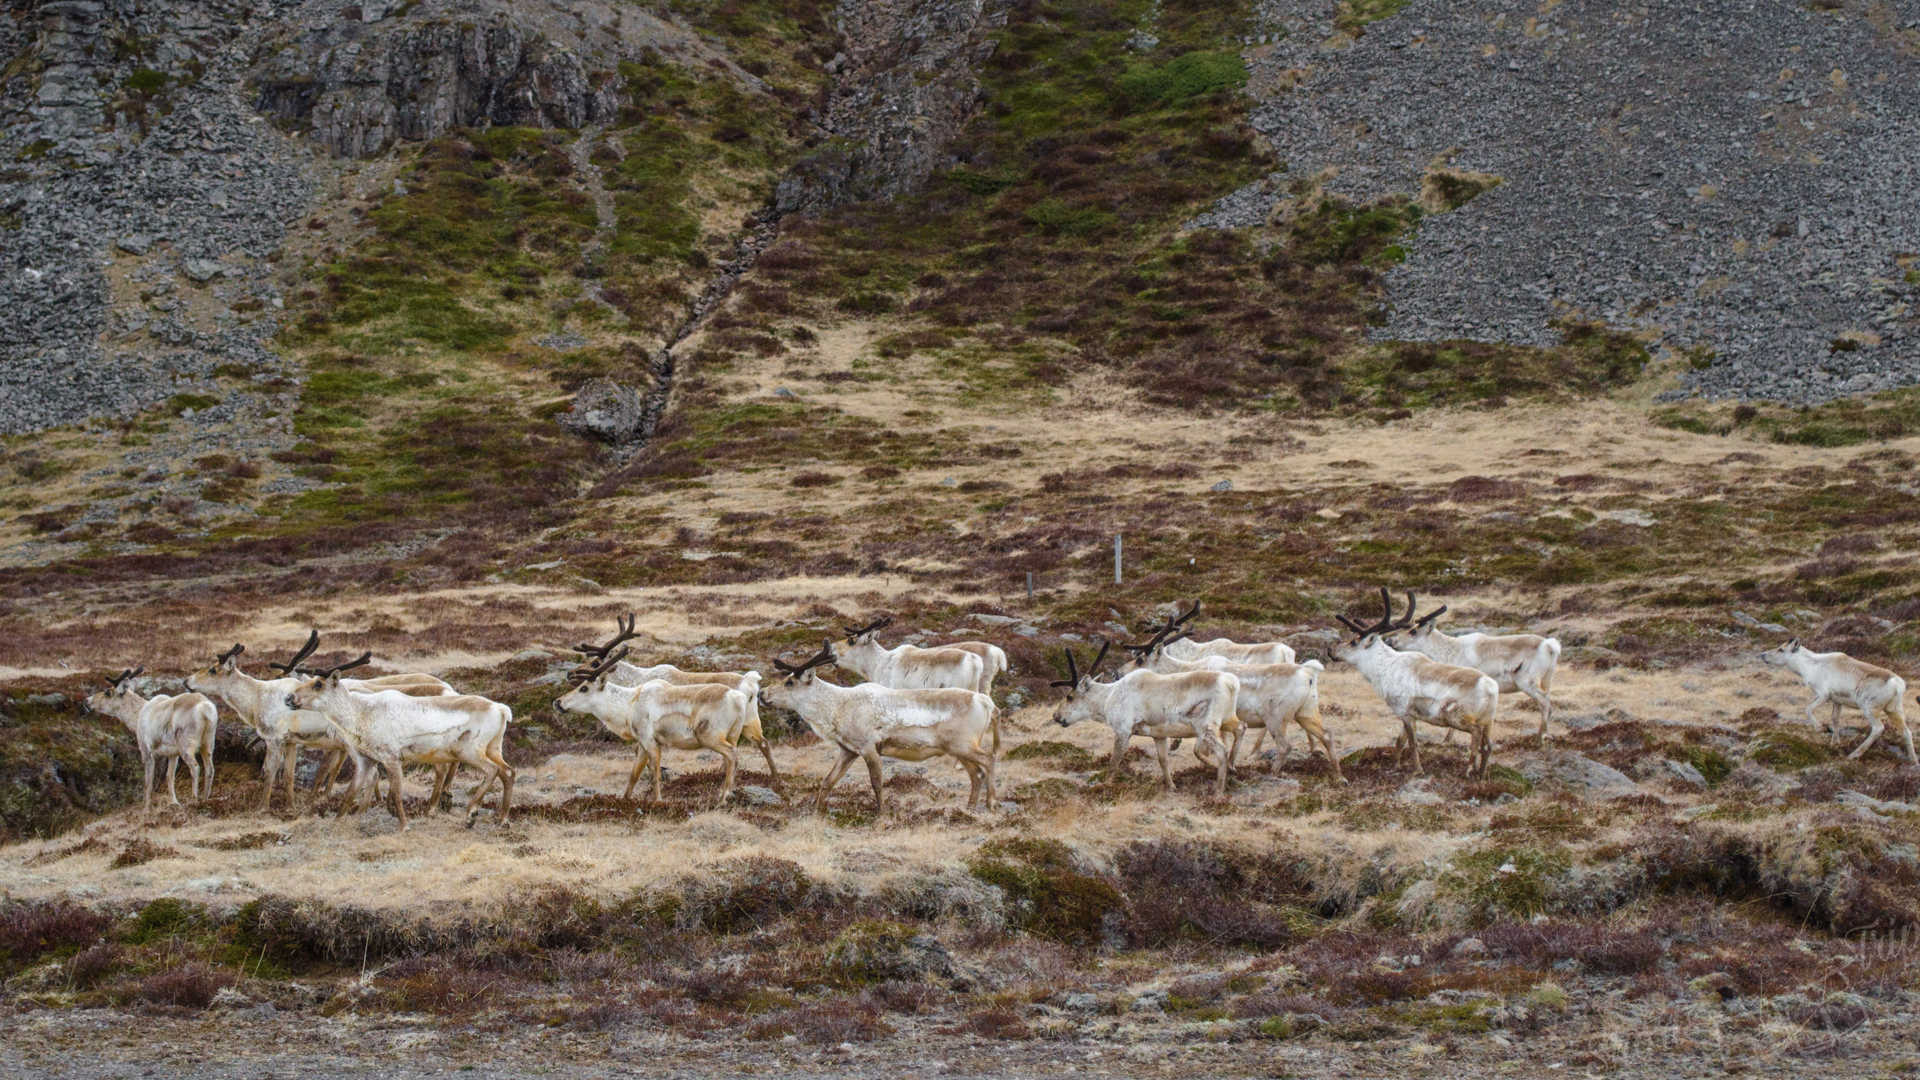 reindeer, reindeer herd, reindeer wild, reindeer iceland, reindeer from car